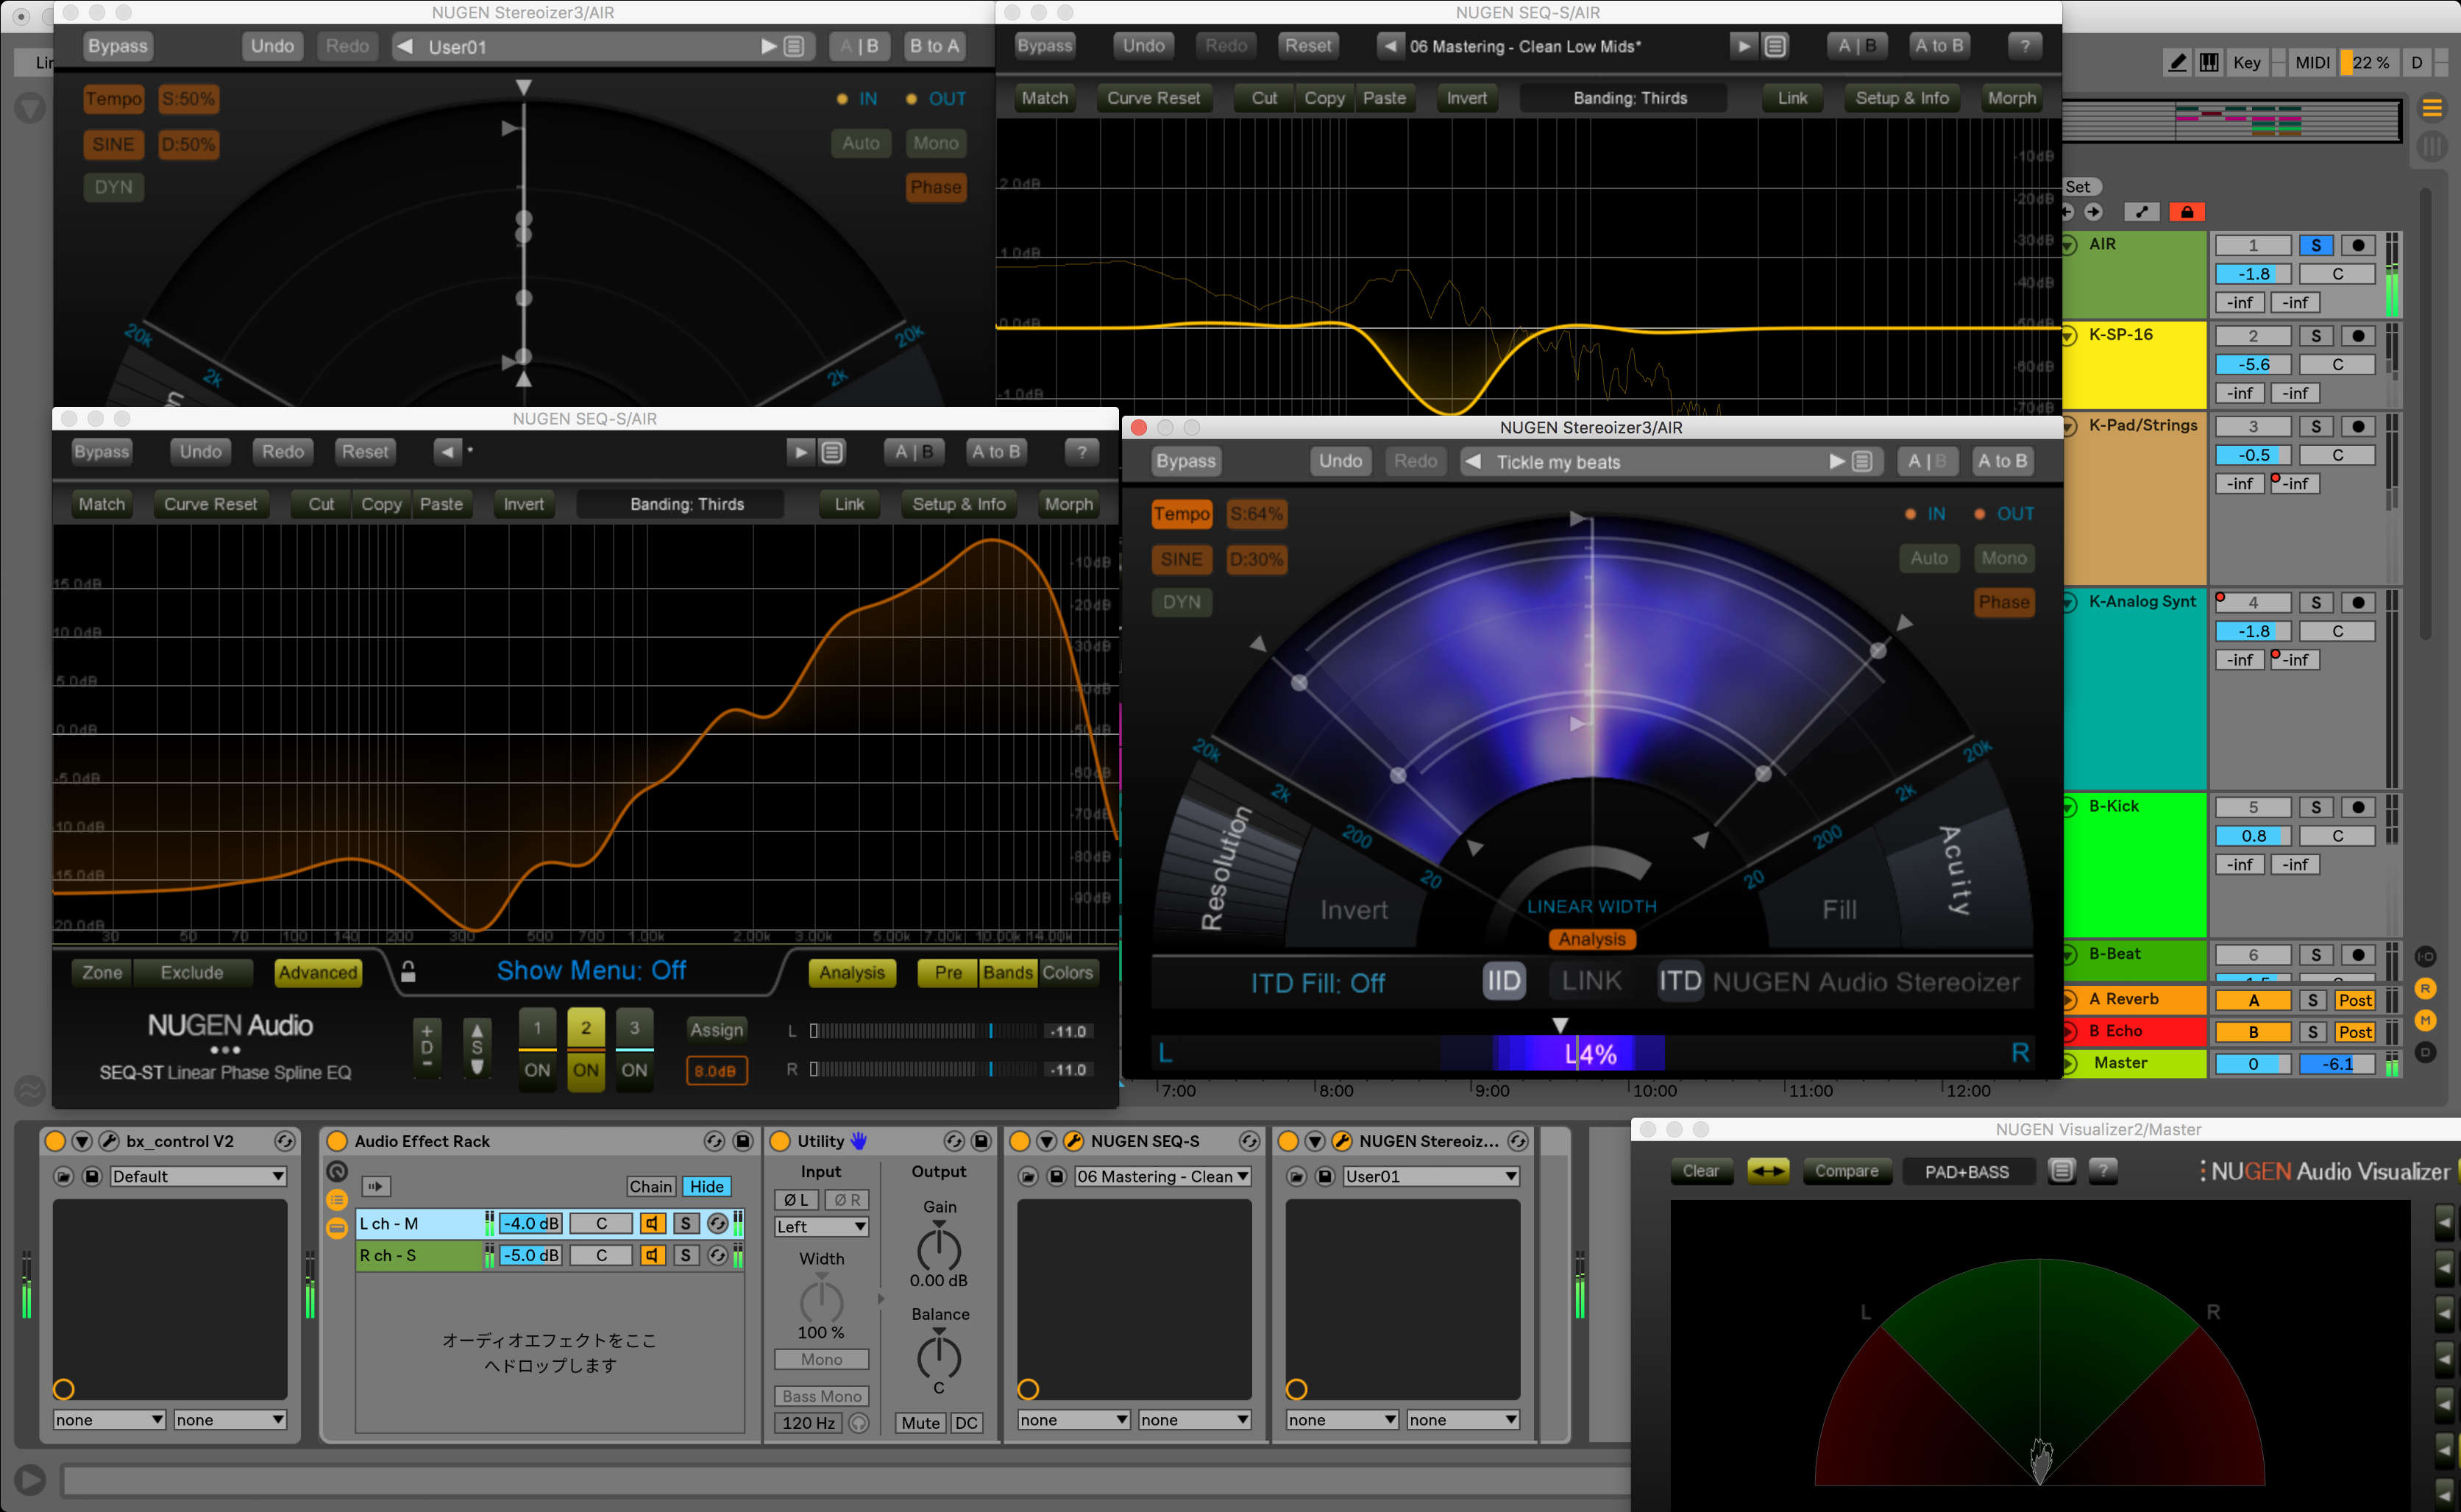 20180509_koyas-nugen-audio-ableton-live-tutorial-03-05-air-stereo-expand-rack